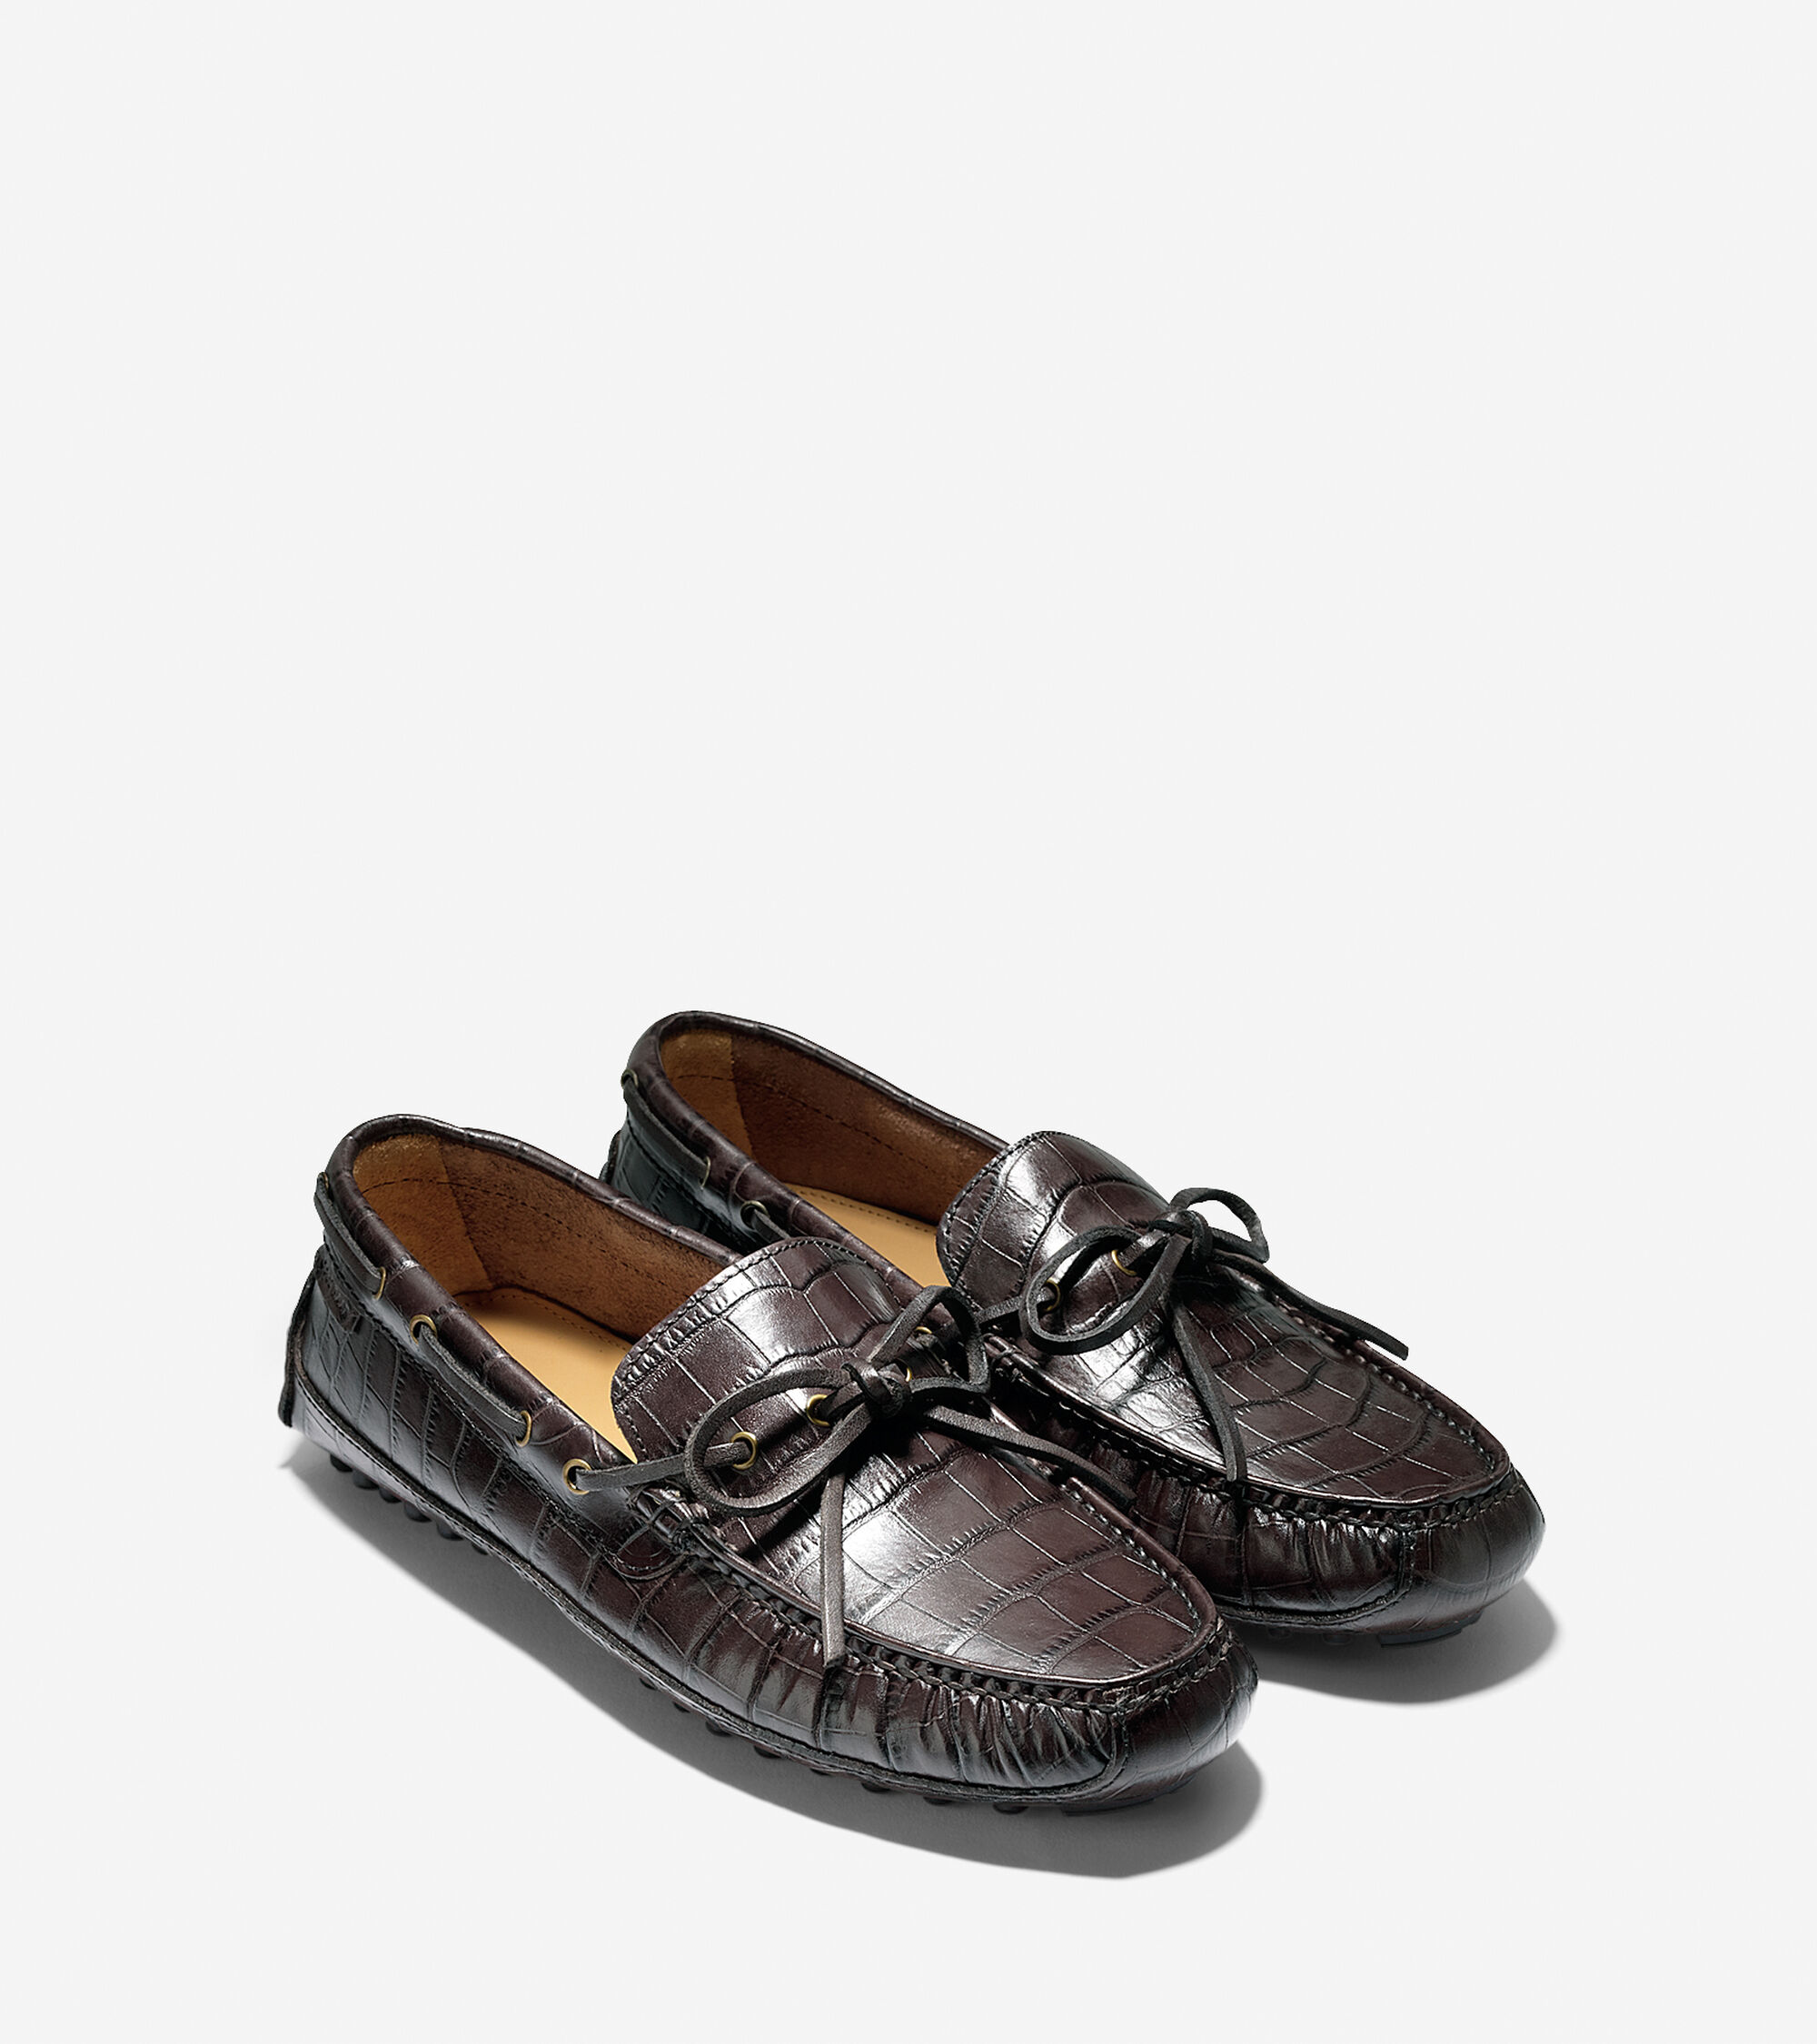 20c50c22960 ... Men s Grant Driving Shoe  Men s Grant Driving Shoe.  COLEHAAN